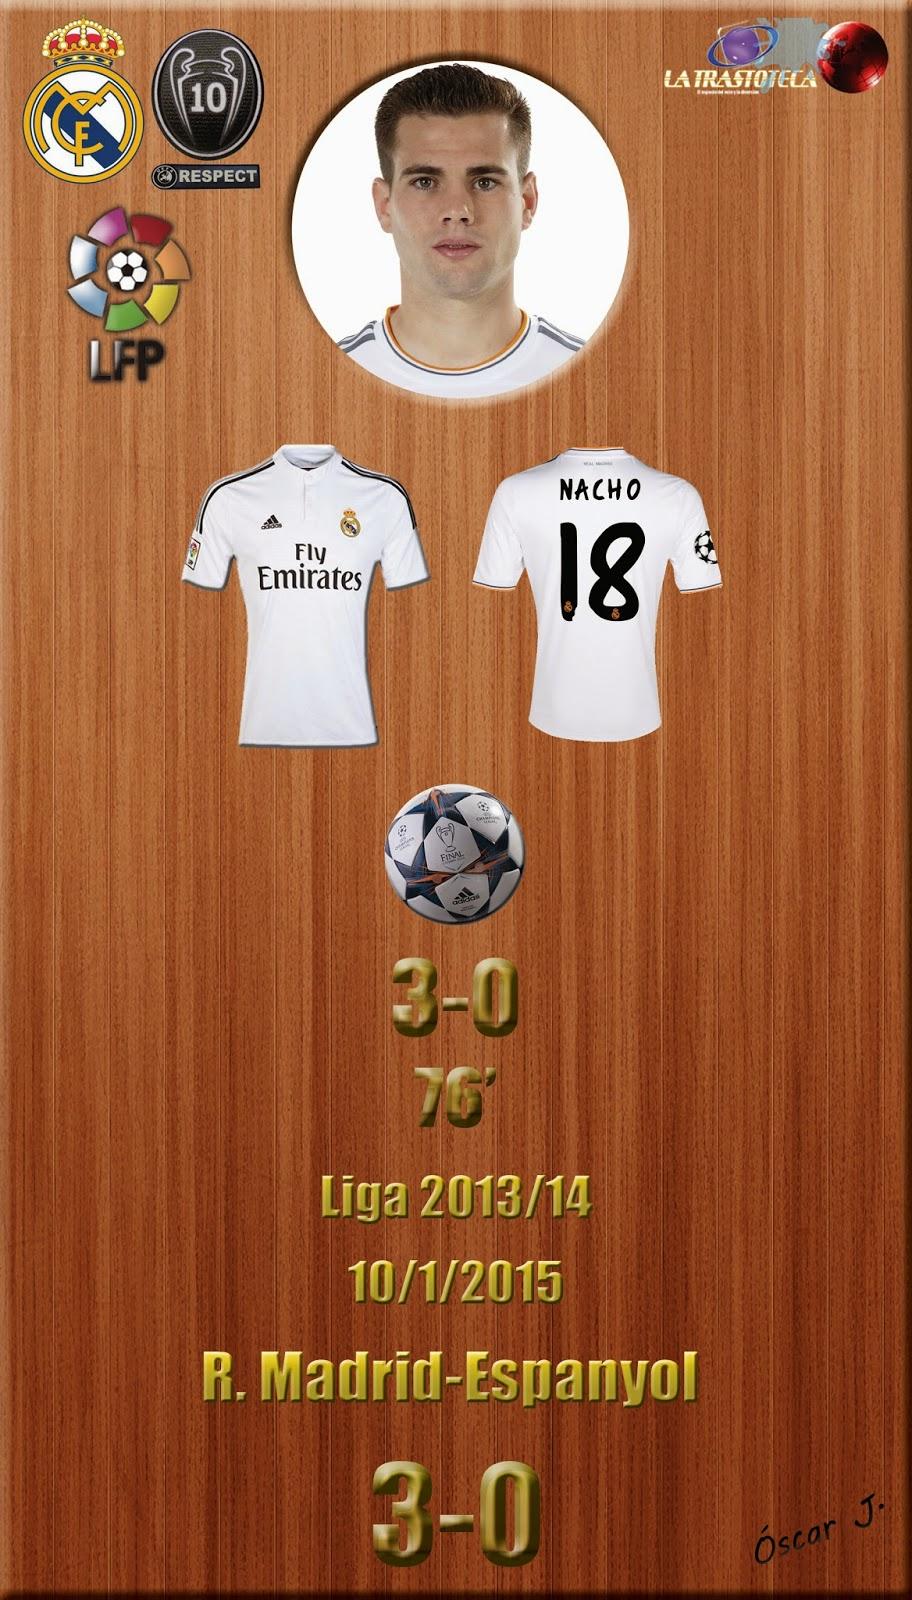 Nacho (3-0) - Real Madrid 3-0 Espanyol - Liga 2014/15 - Jornada 18 - (10/1/2015)